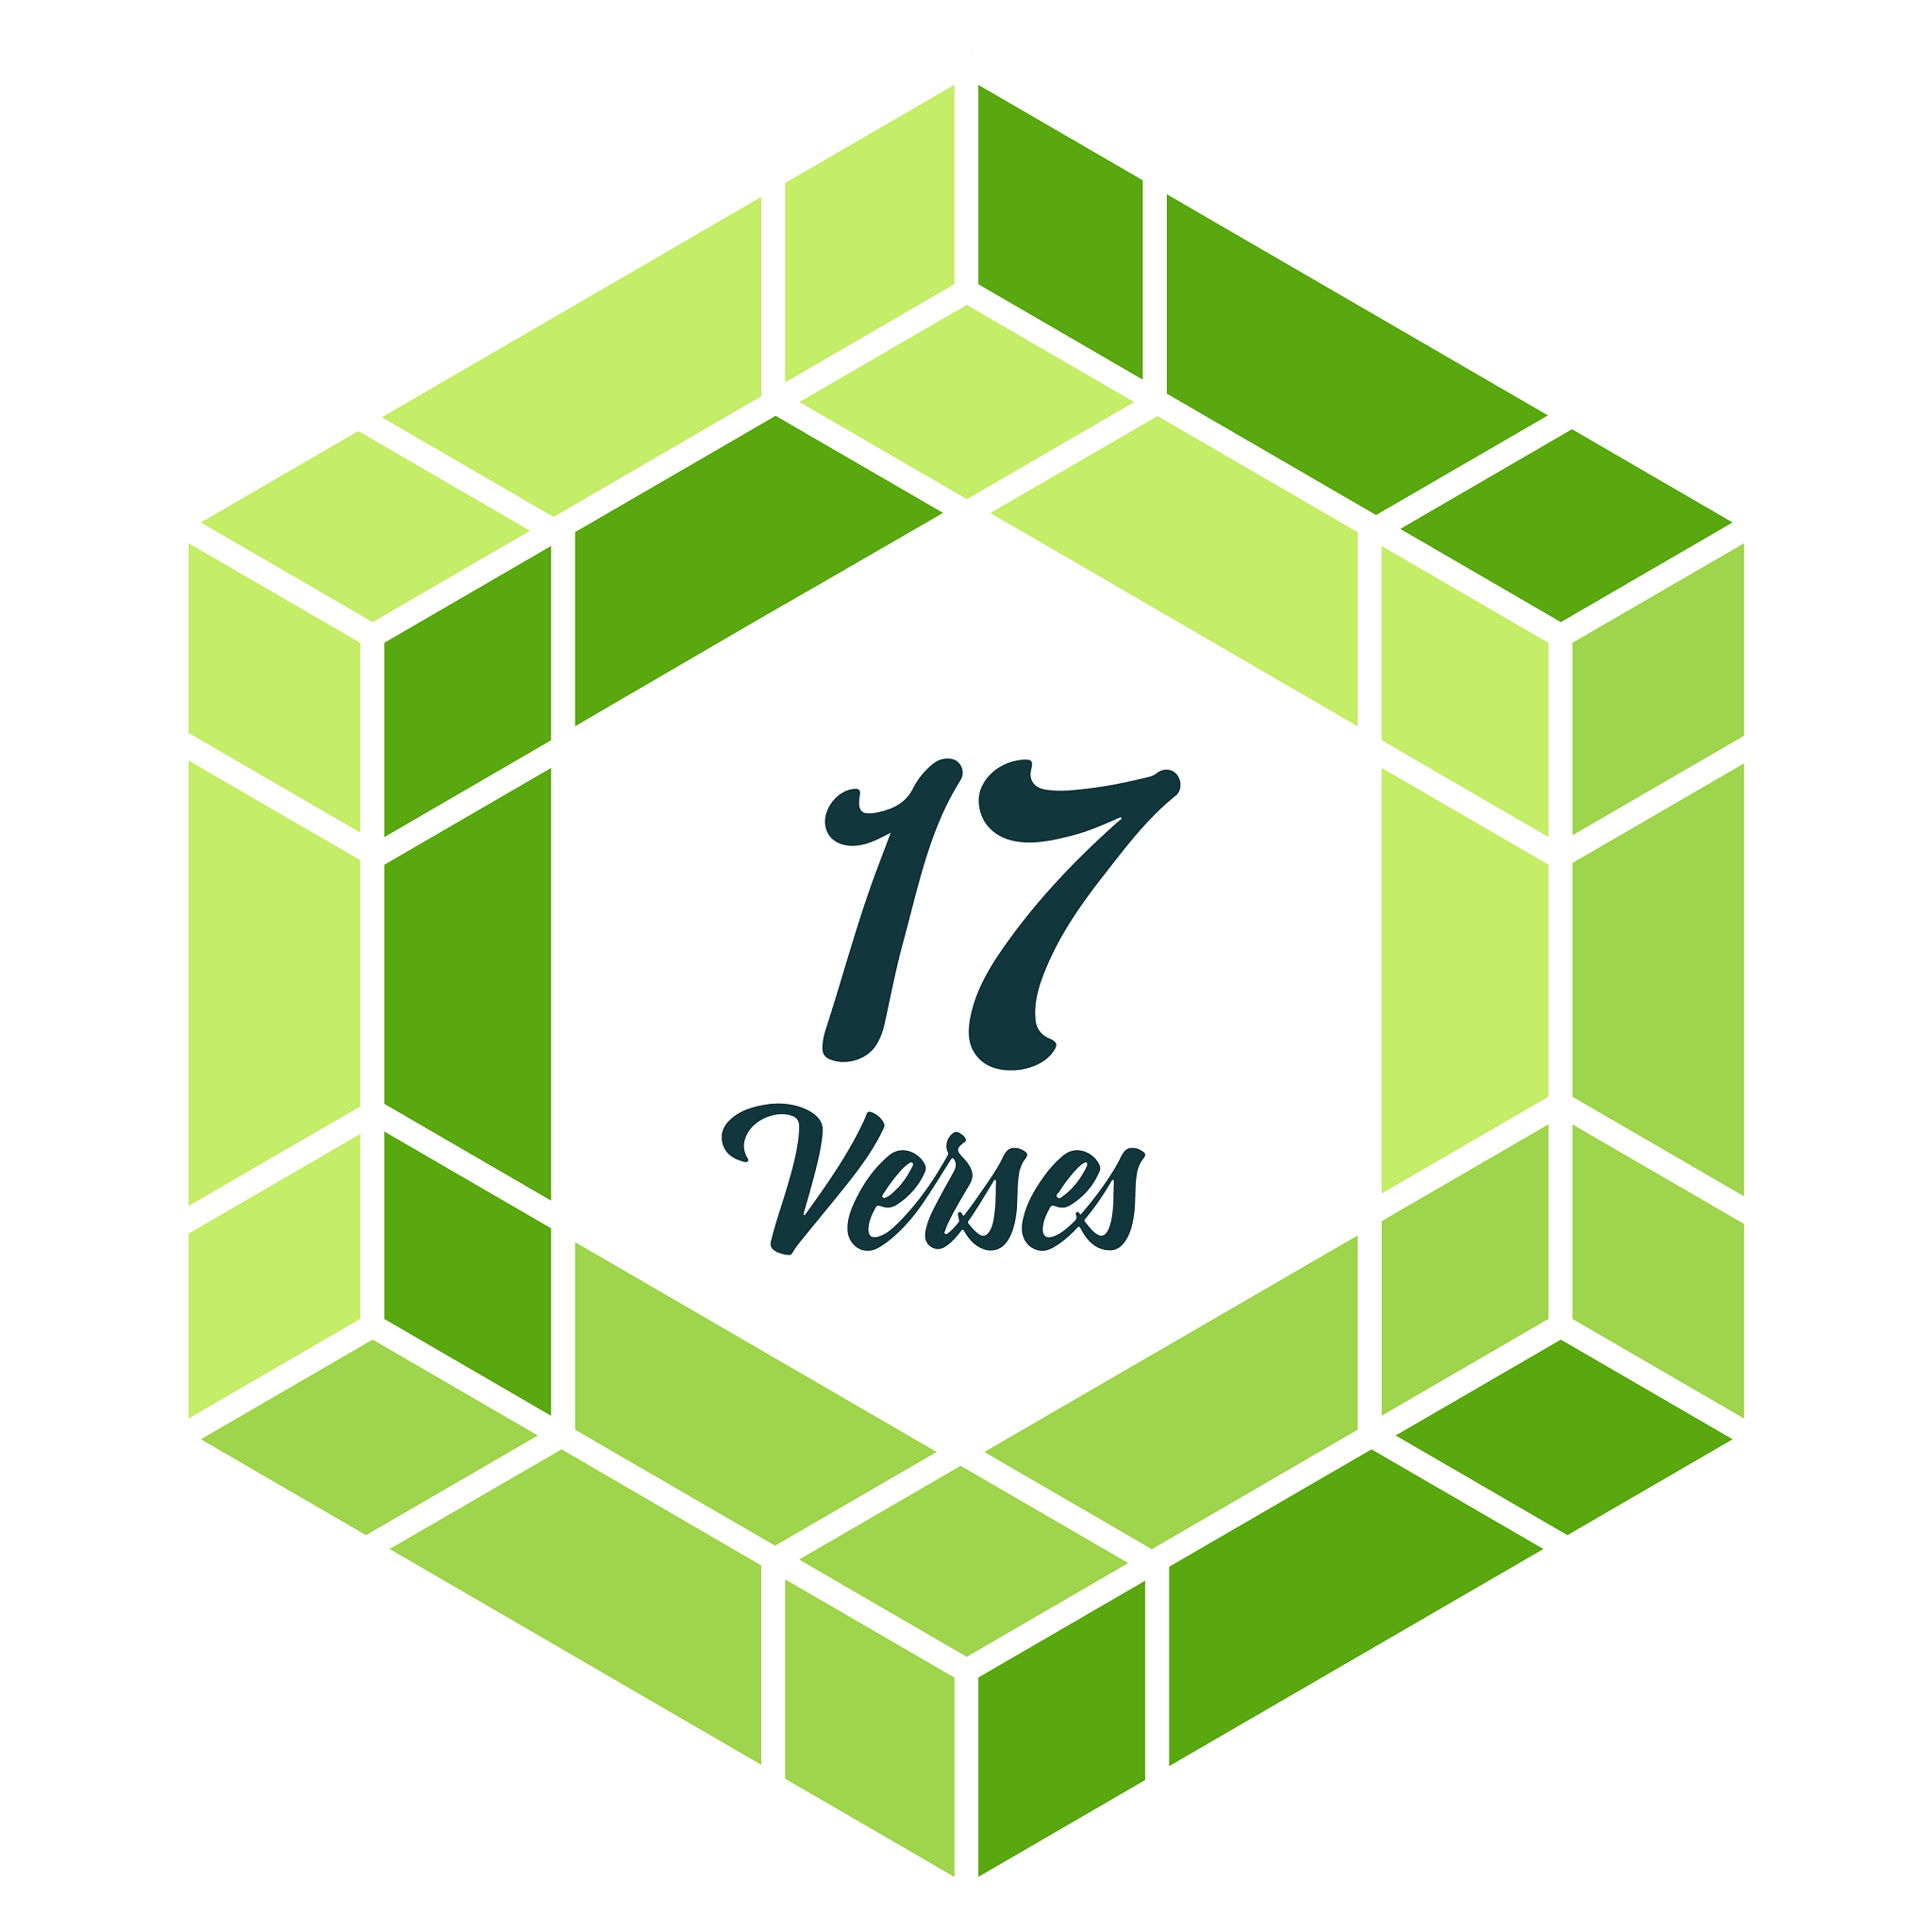 Year 2 - Surah 4 (An-Nisâ), Verses 15-23